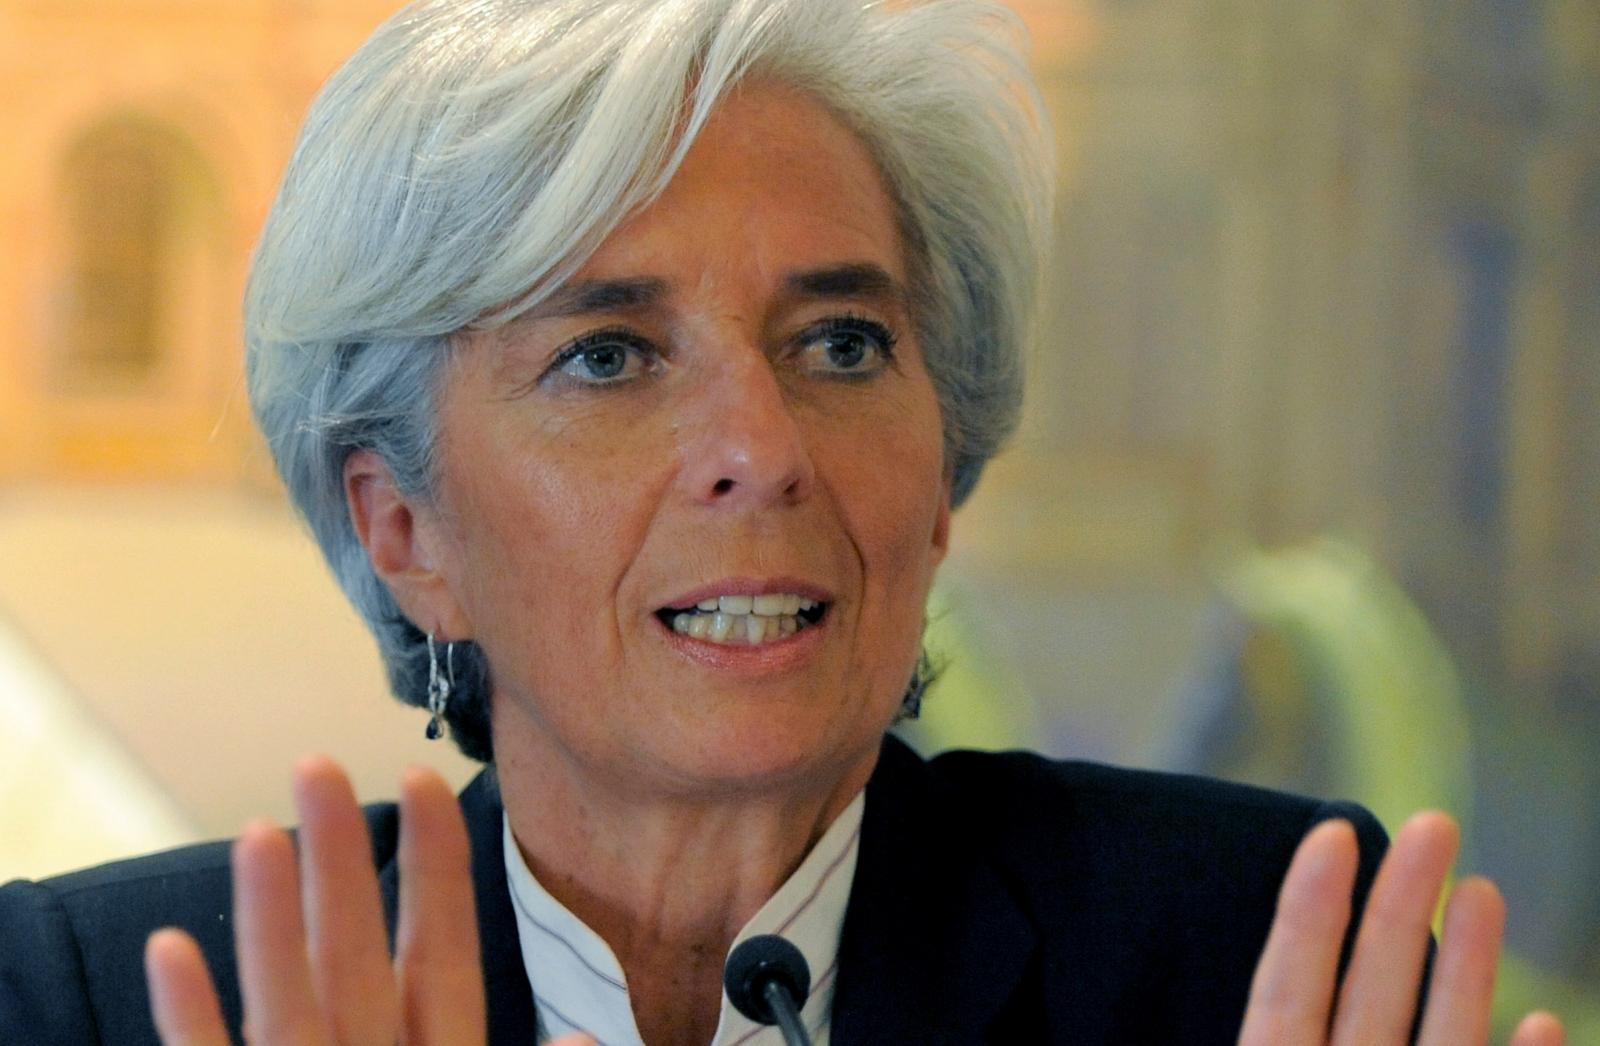 IMF Boss Christine Lagarde Charged Over Bernard Tapie Corruption Probe